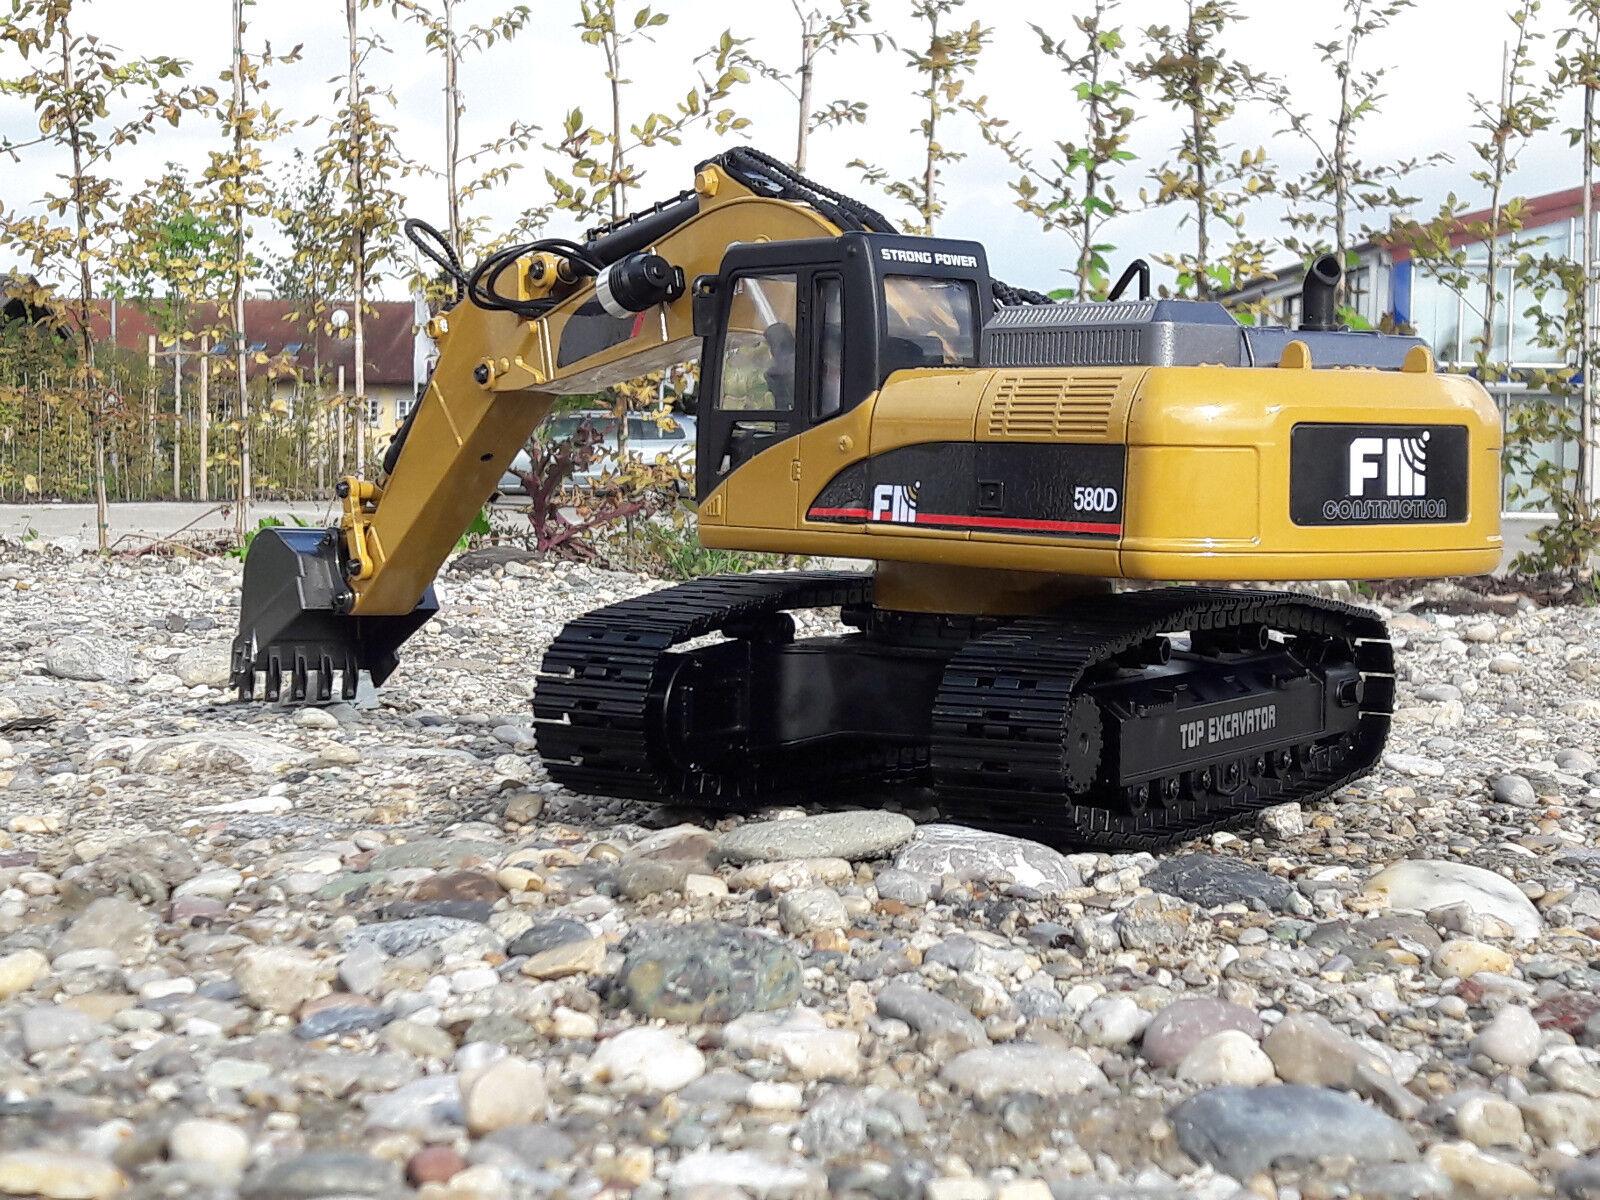 Huina Crawler Excavator 1580 1 14 Rtr V3 Vollmettuttiborsager 2 Batteries